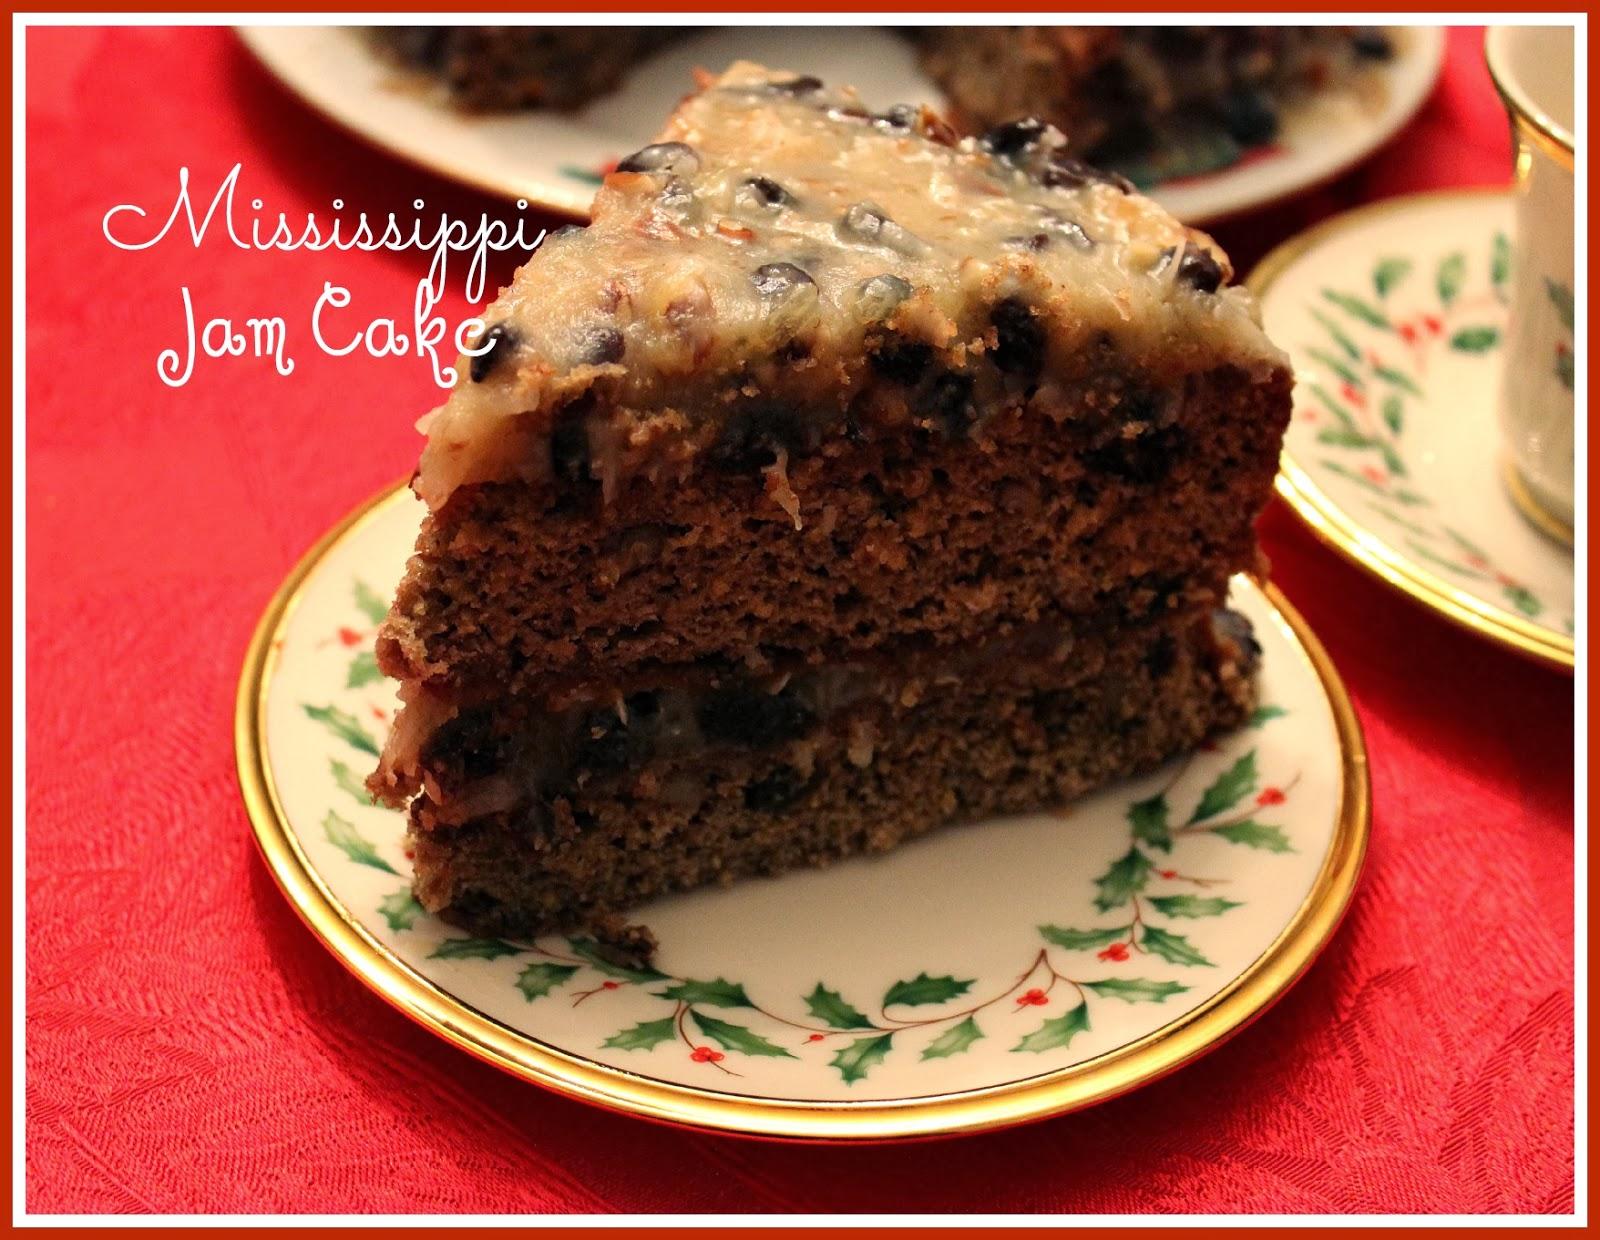 Jelly Cake Recipe Video: Sweet Tea And Cornbread: Aunt Tootsie's Mississippi Jam Cake